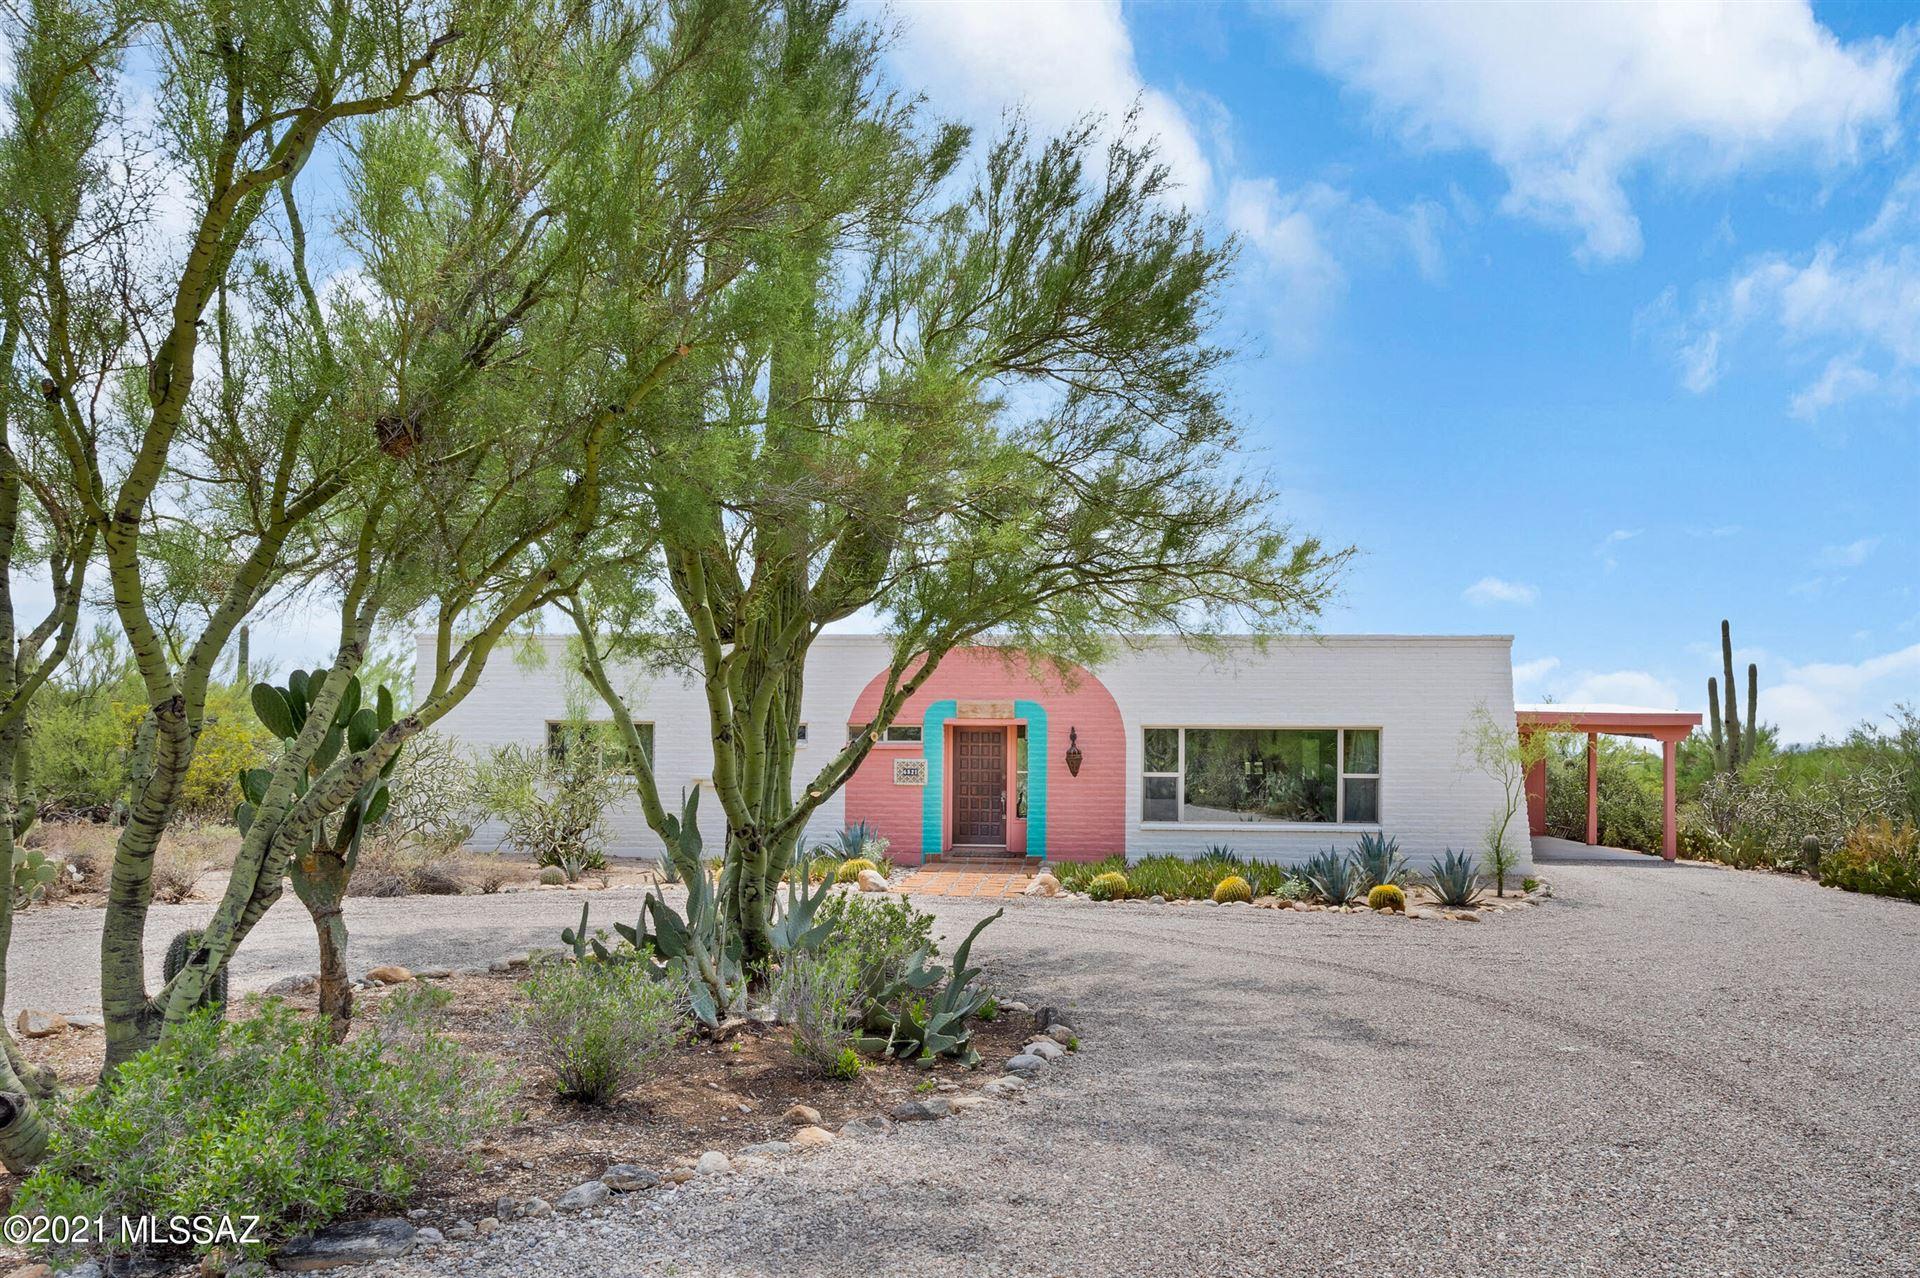 6521 N Calle Padre Felipe, Tucson, AZ 85718 - MLS#: 22118855